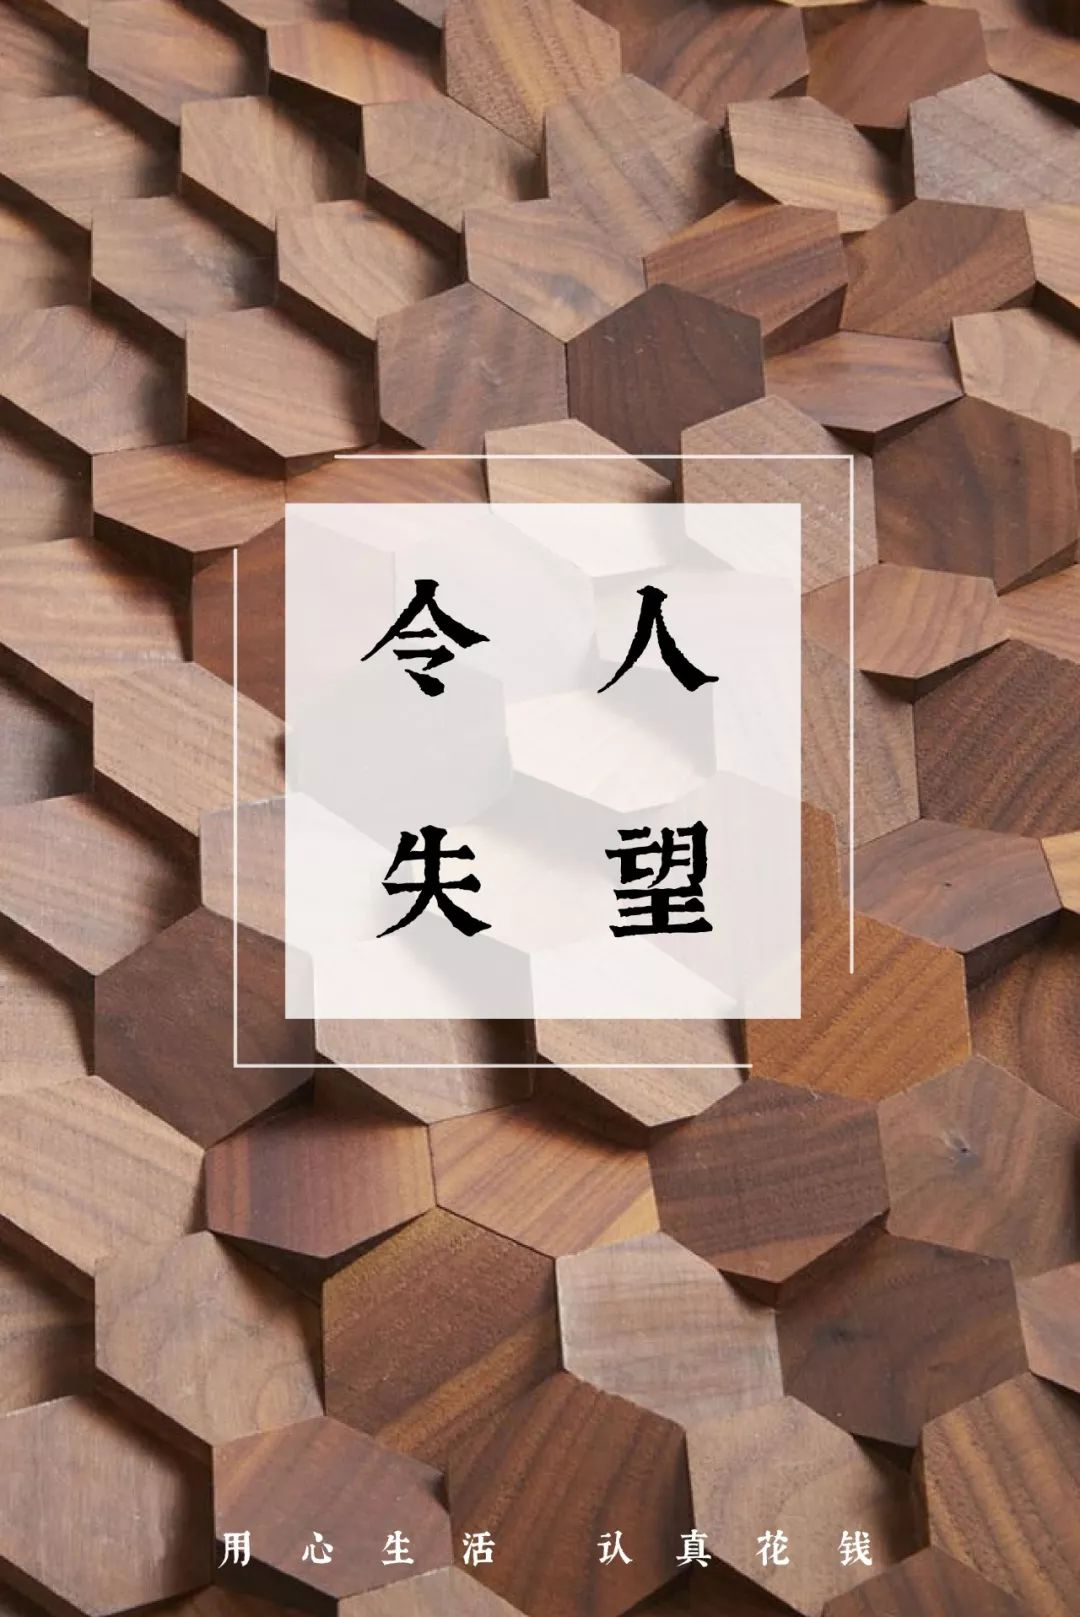 MUJI 良心不会痛吗,竟把胶合板家具当实木卖?